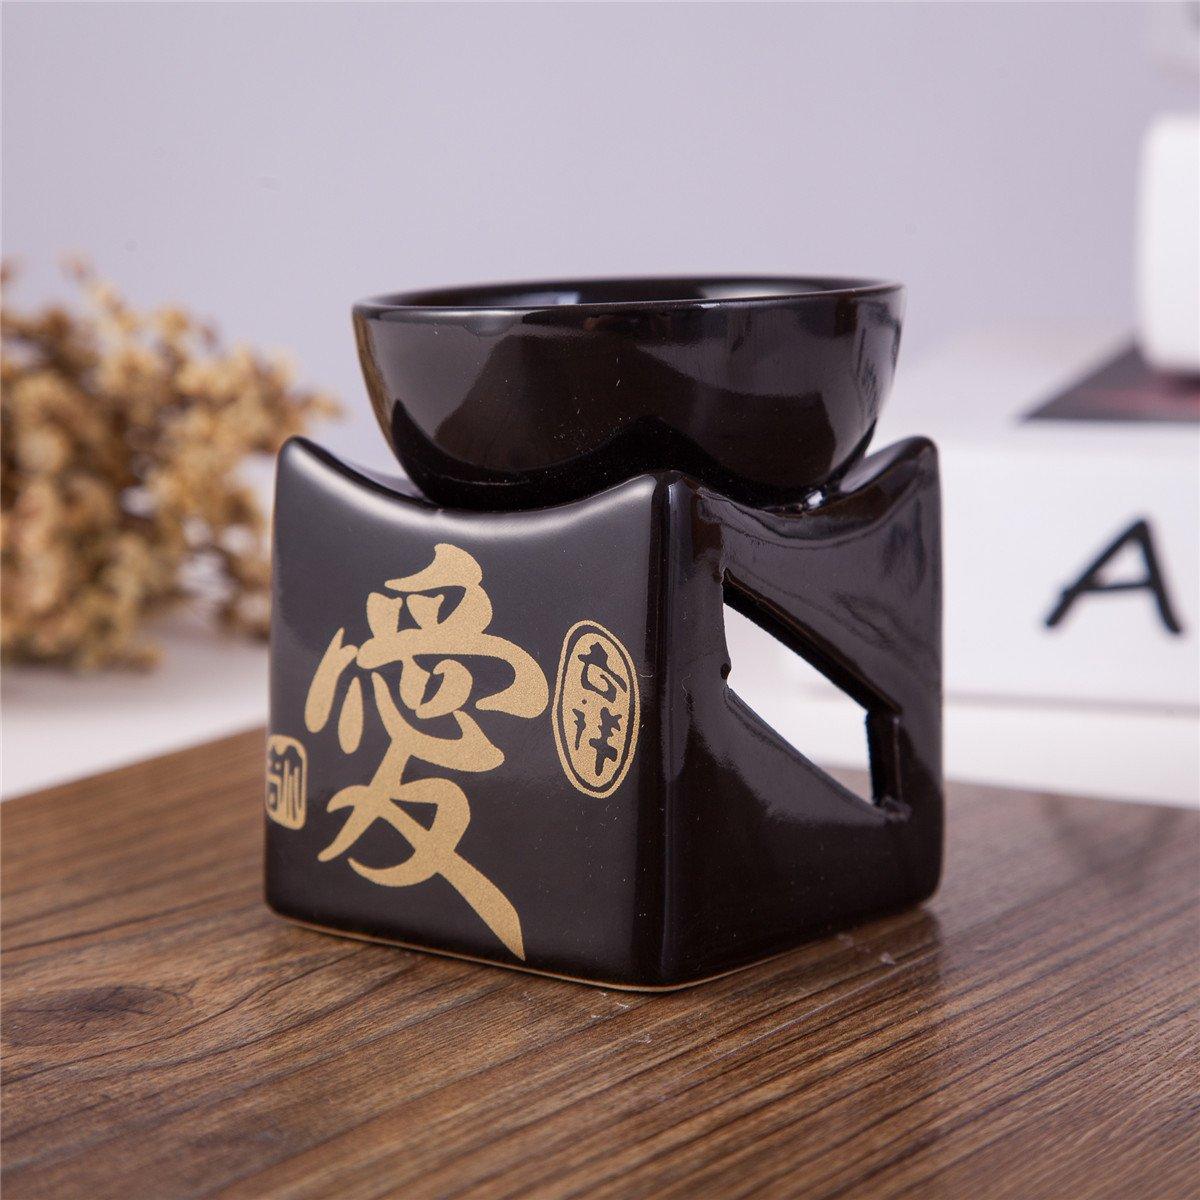 "Feng Shui Zen Ceramic Essential Oil Burner Diffuser Tea Light Holder Great For Home Decoration & Aromatherapy ""LOVE"" OLBA105"